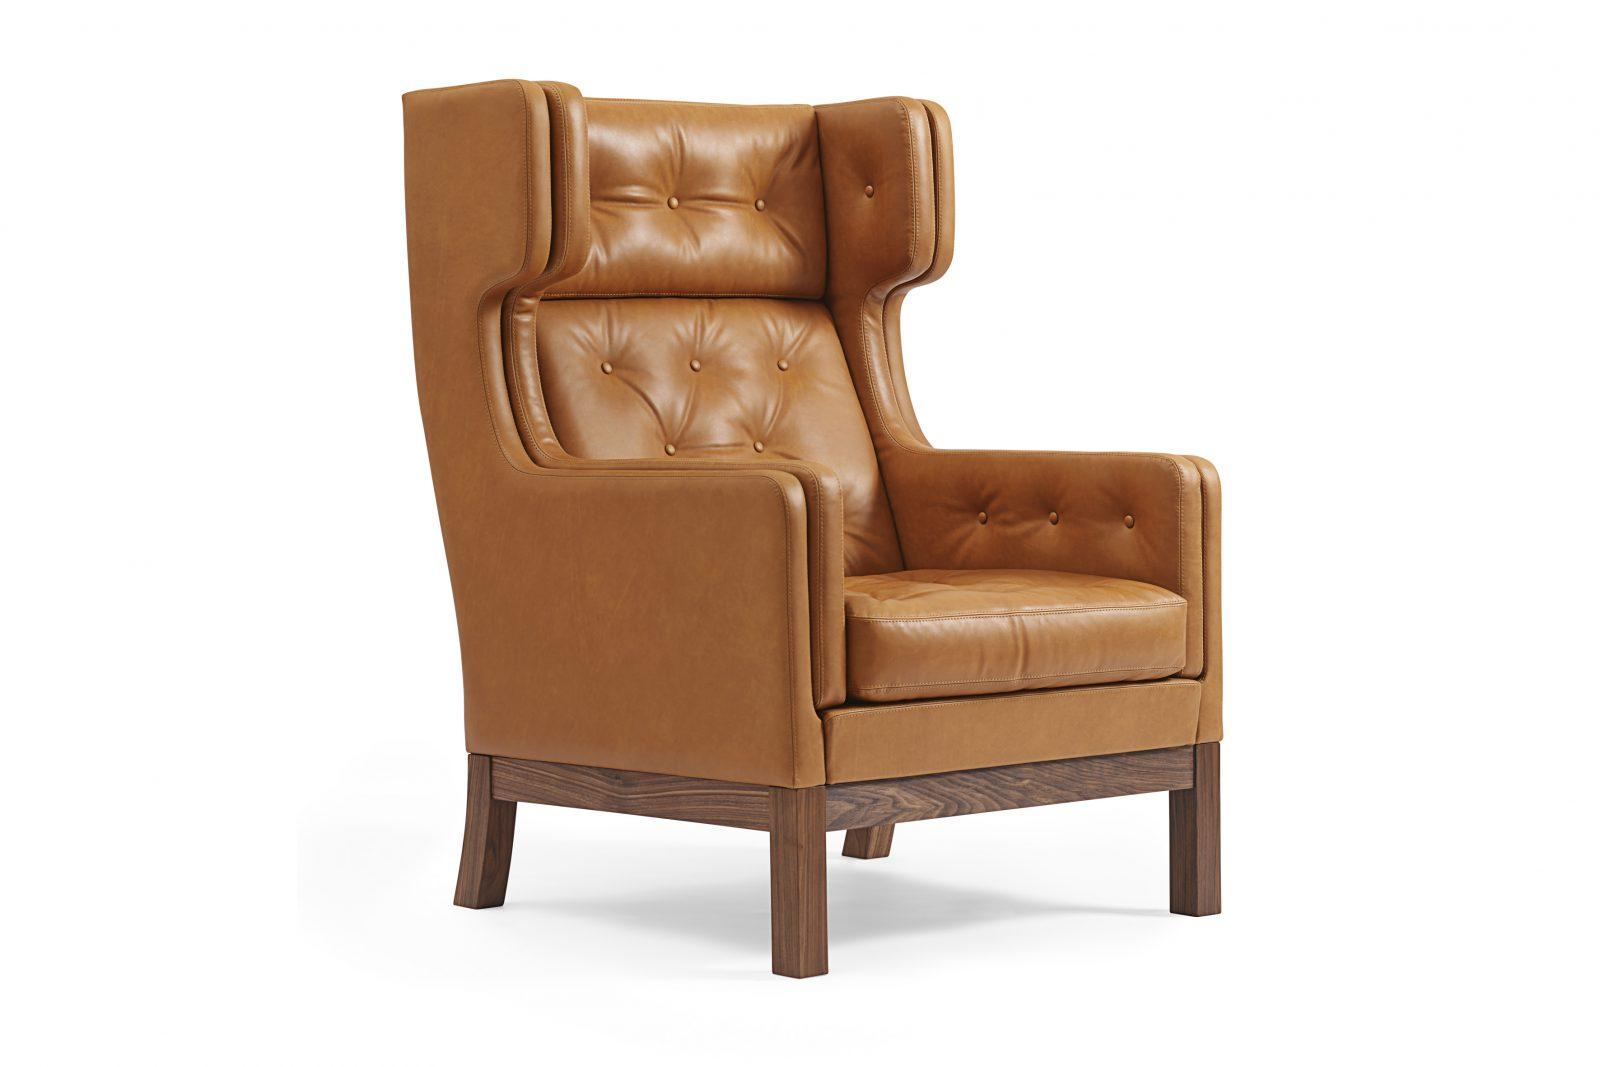 erik j rgensen ej 315 sofa and armchair nordic urban gmbh. Black Bedroom Furniture Sets. Home Design Ideas